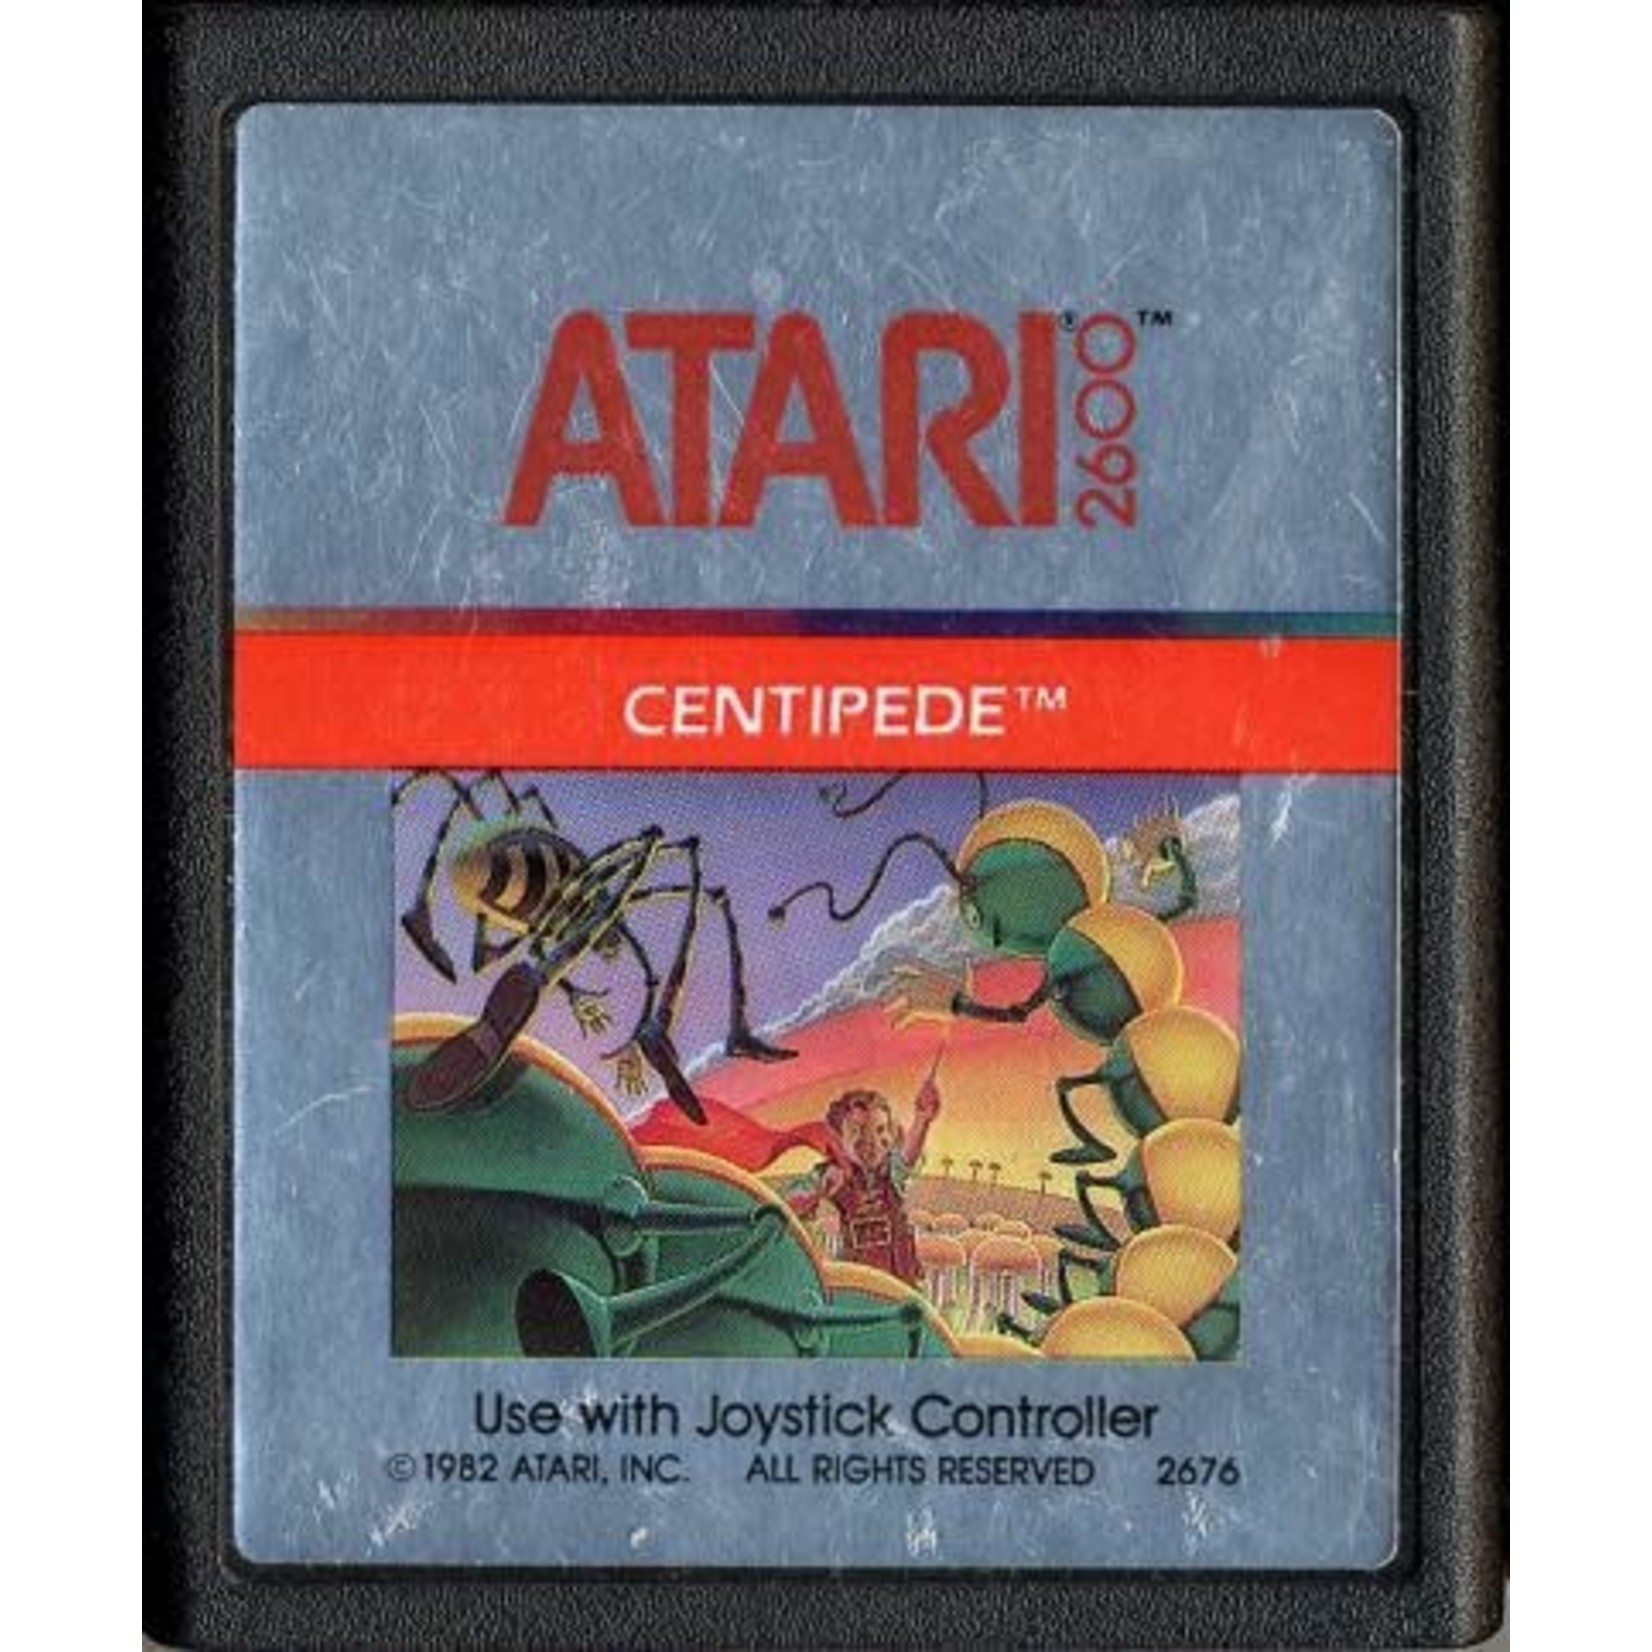 atariu-Centipede (cart only)